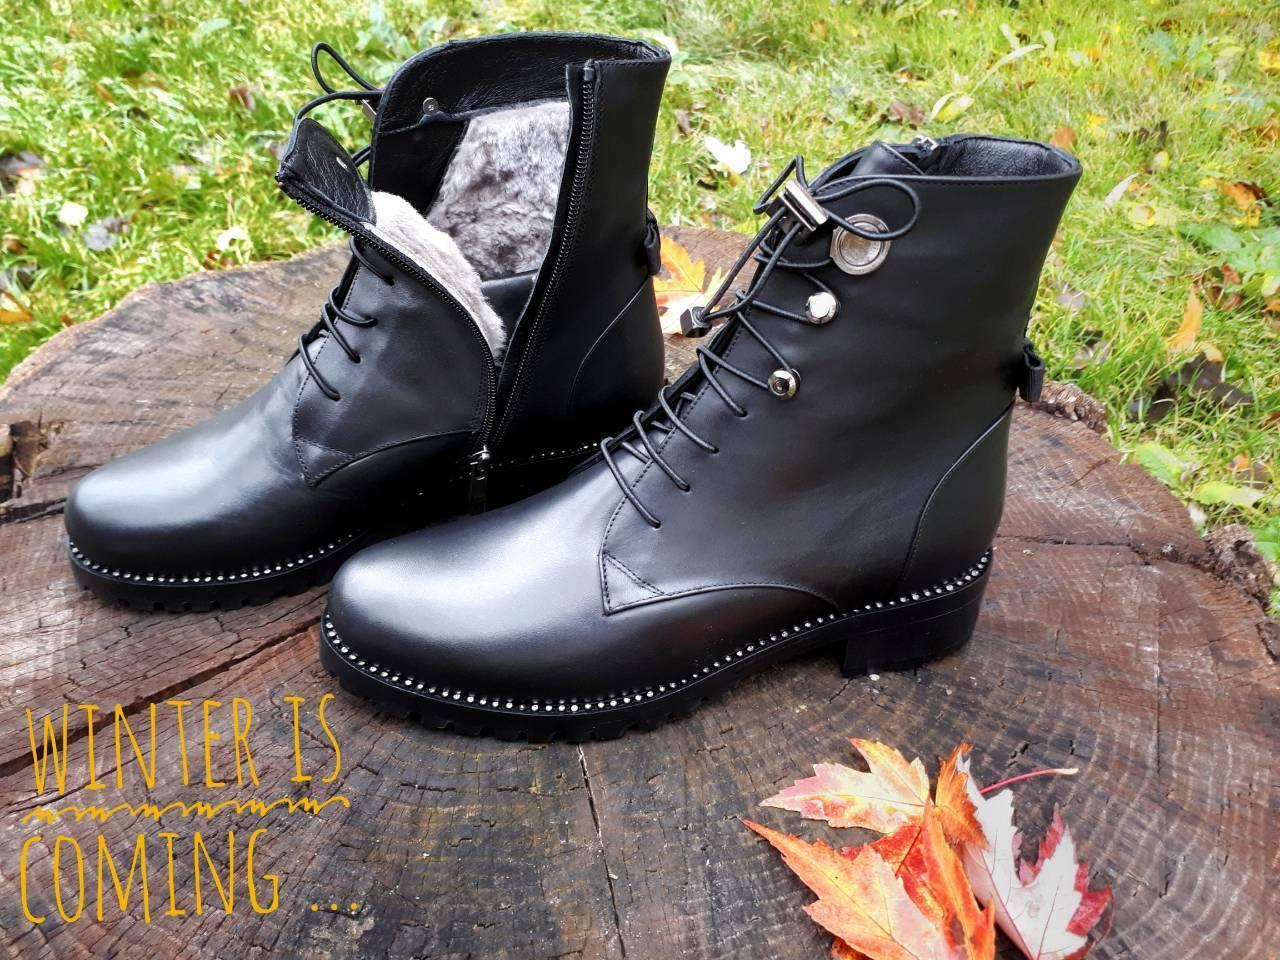 6e1d88011eb8 Ботинки женские кожаные зимние с мехом, на низком каблуке Tucino на ...